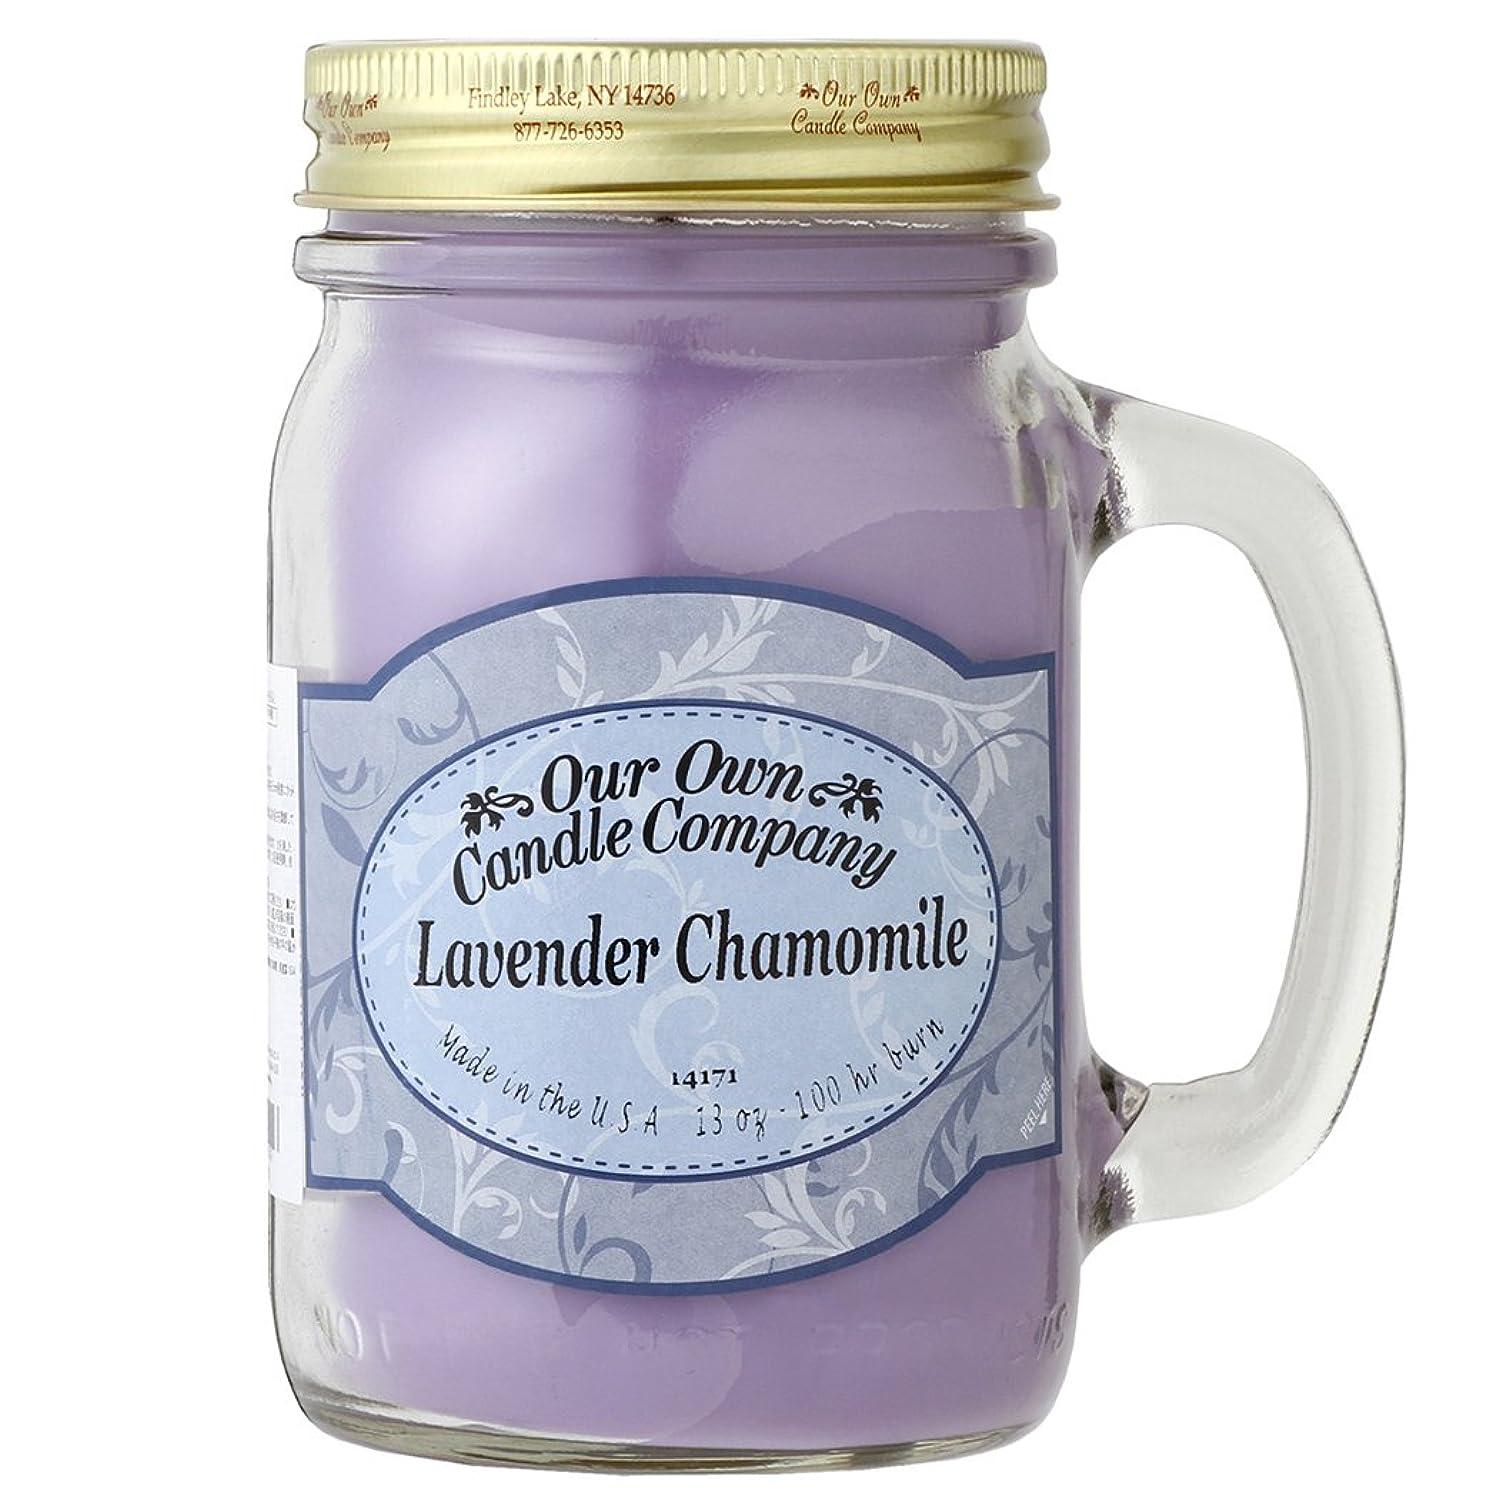 Our Own Candle Company メイソンジャーキャンドル ラージサイズ ラベンダーカモミール OU100070